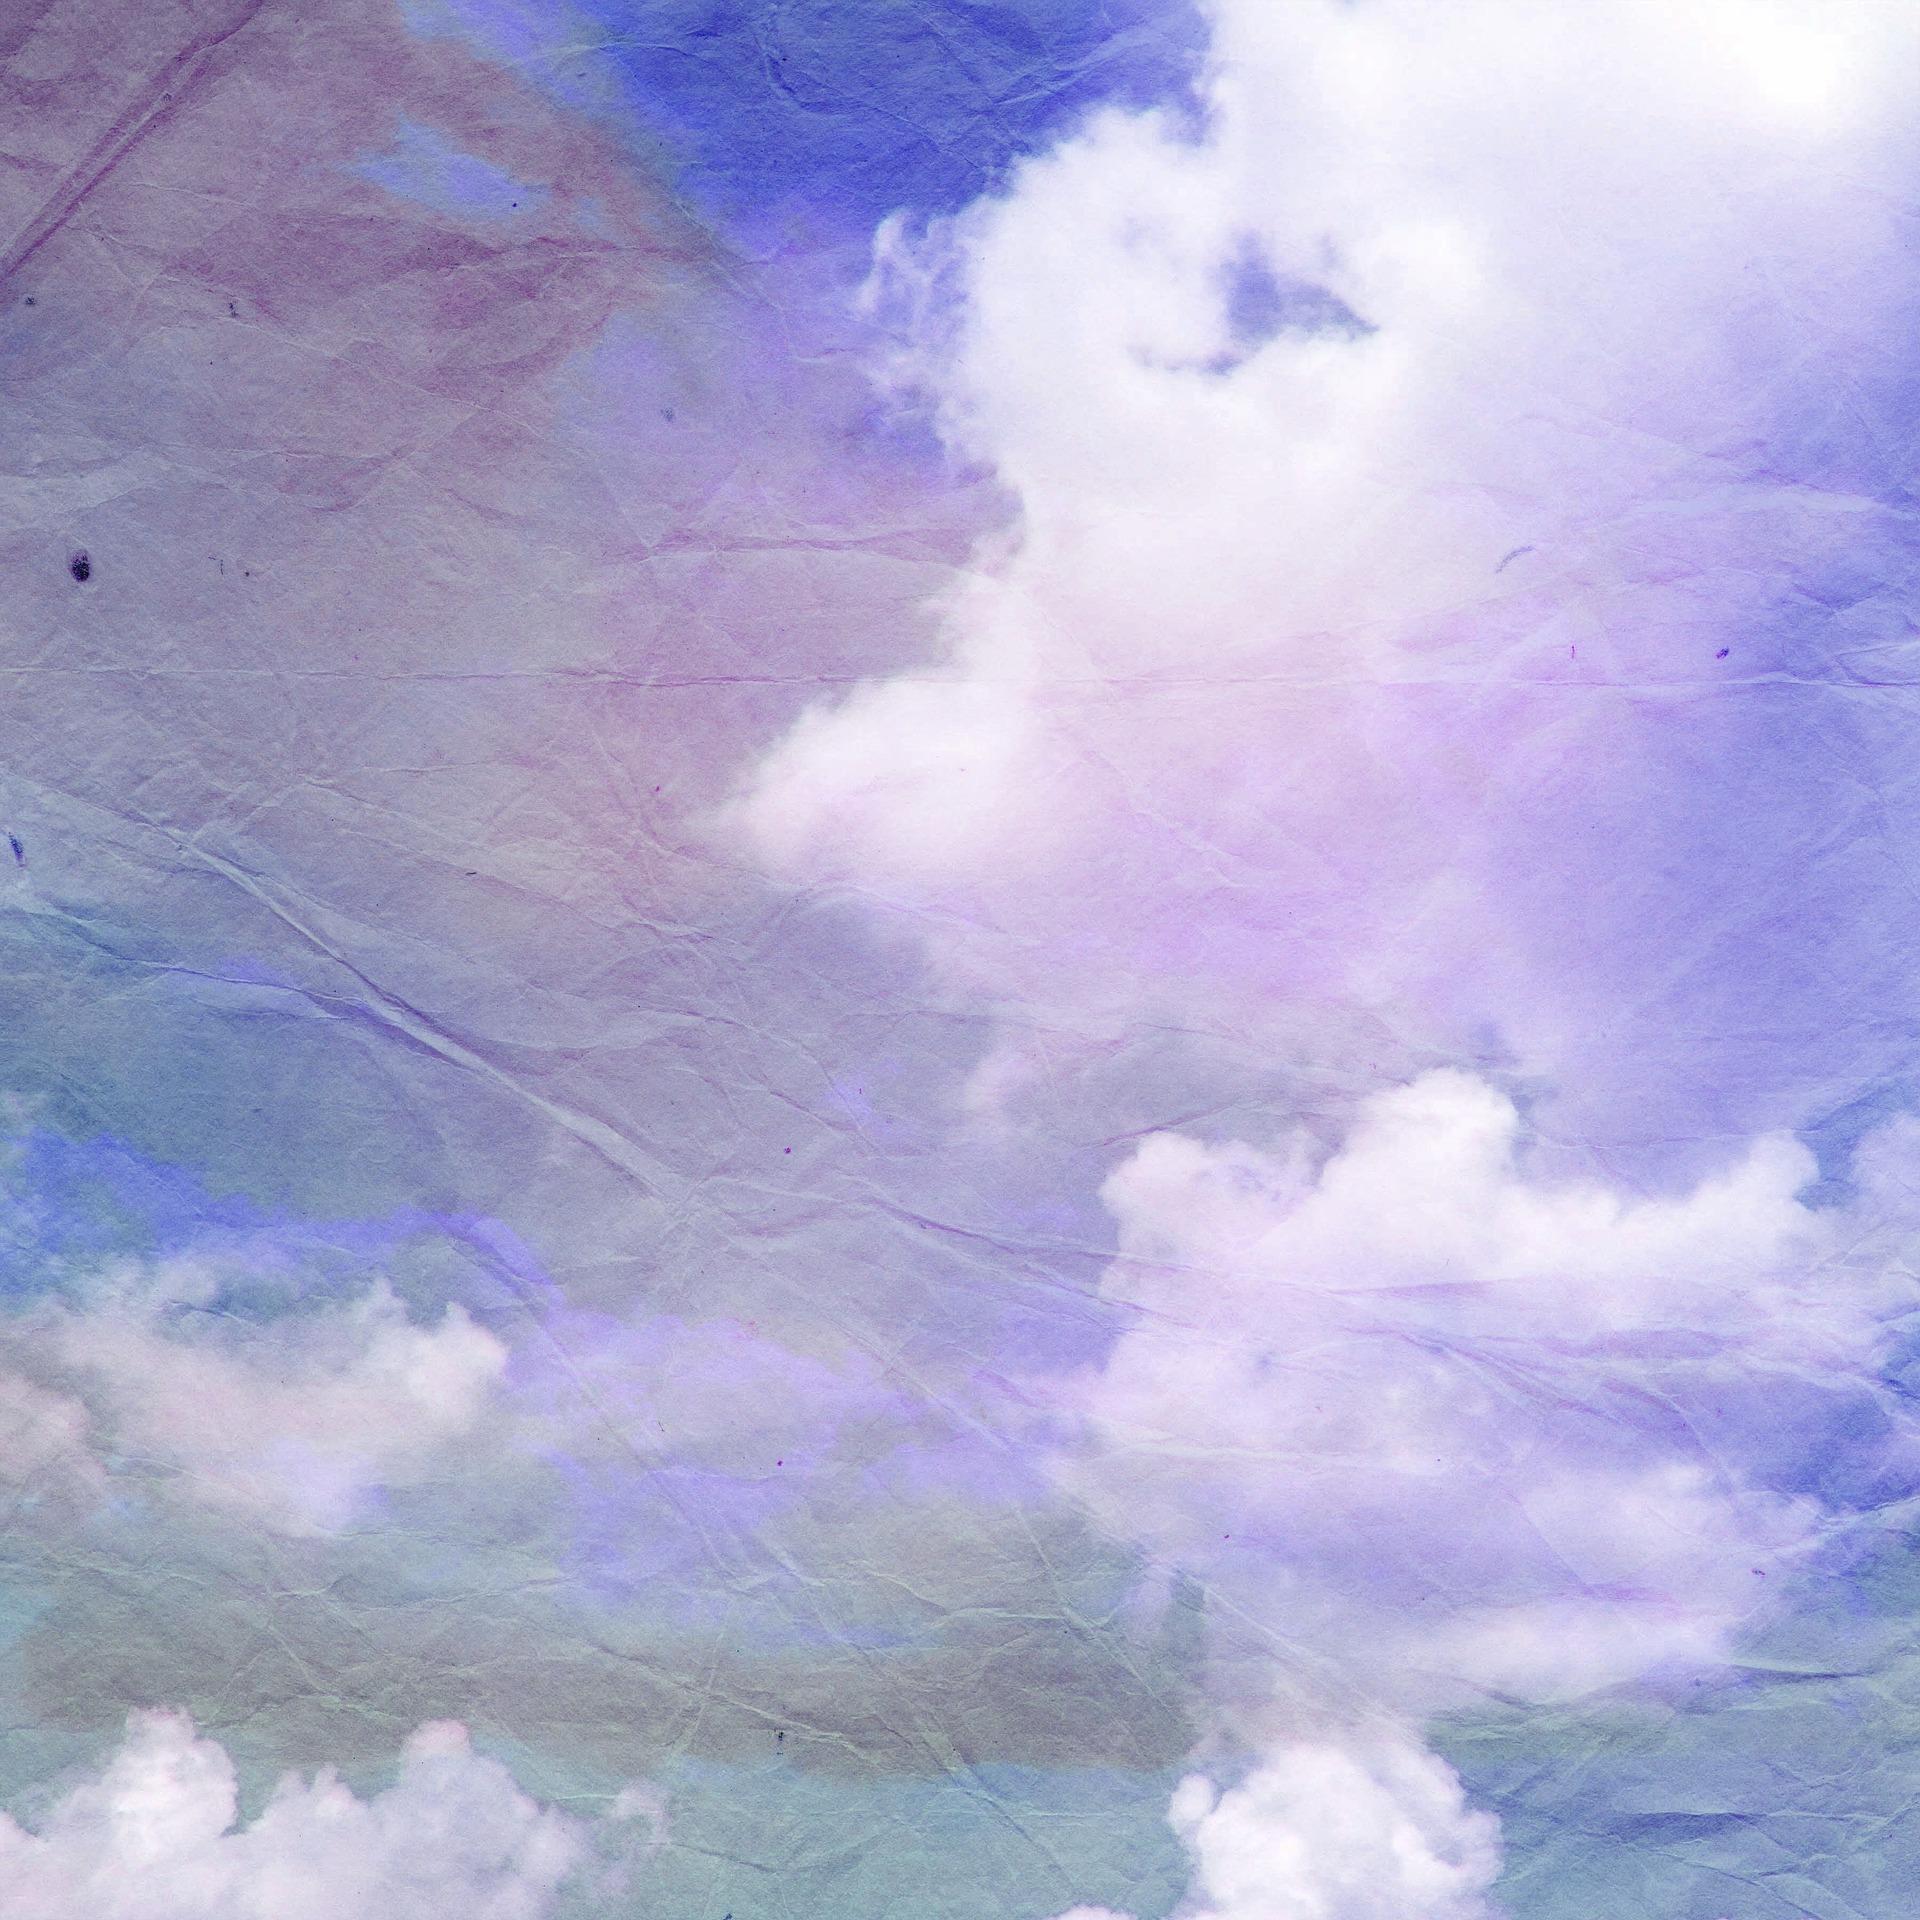 White Clouds, Cloud, Design, Texture, White, HQ Photo